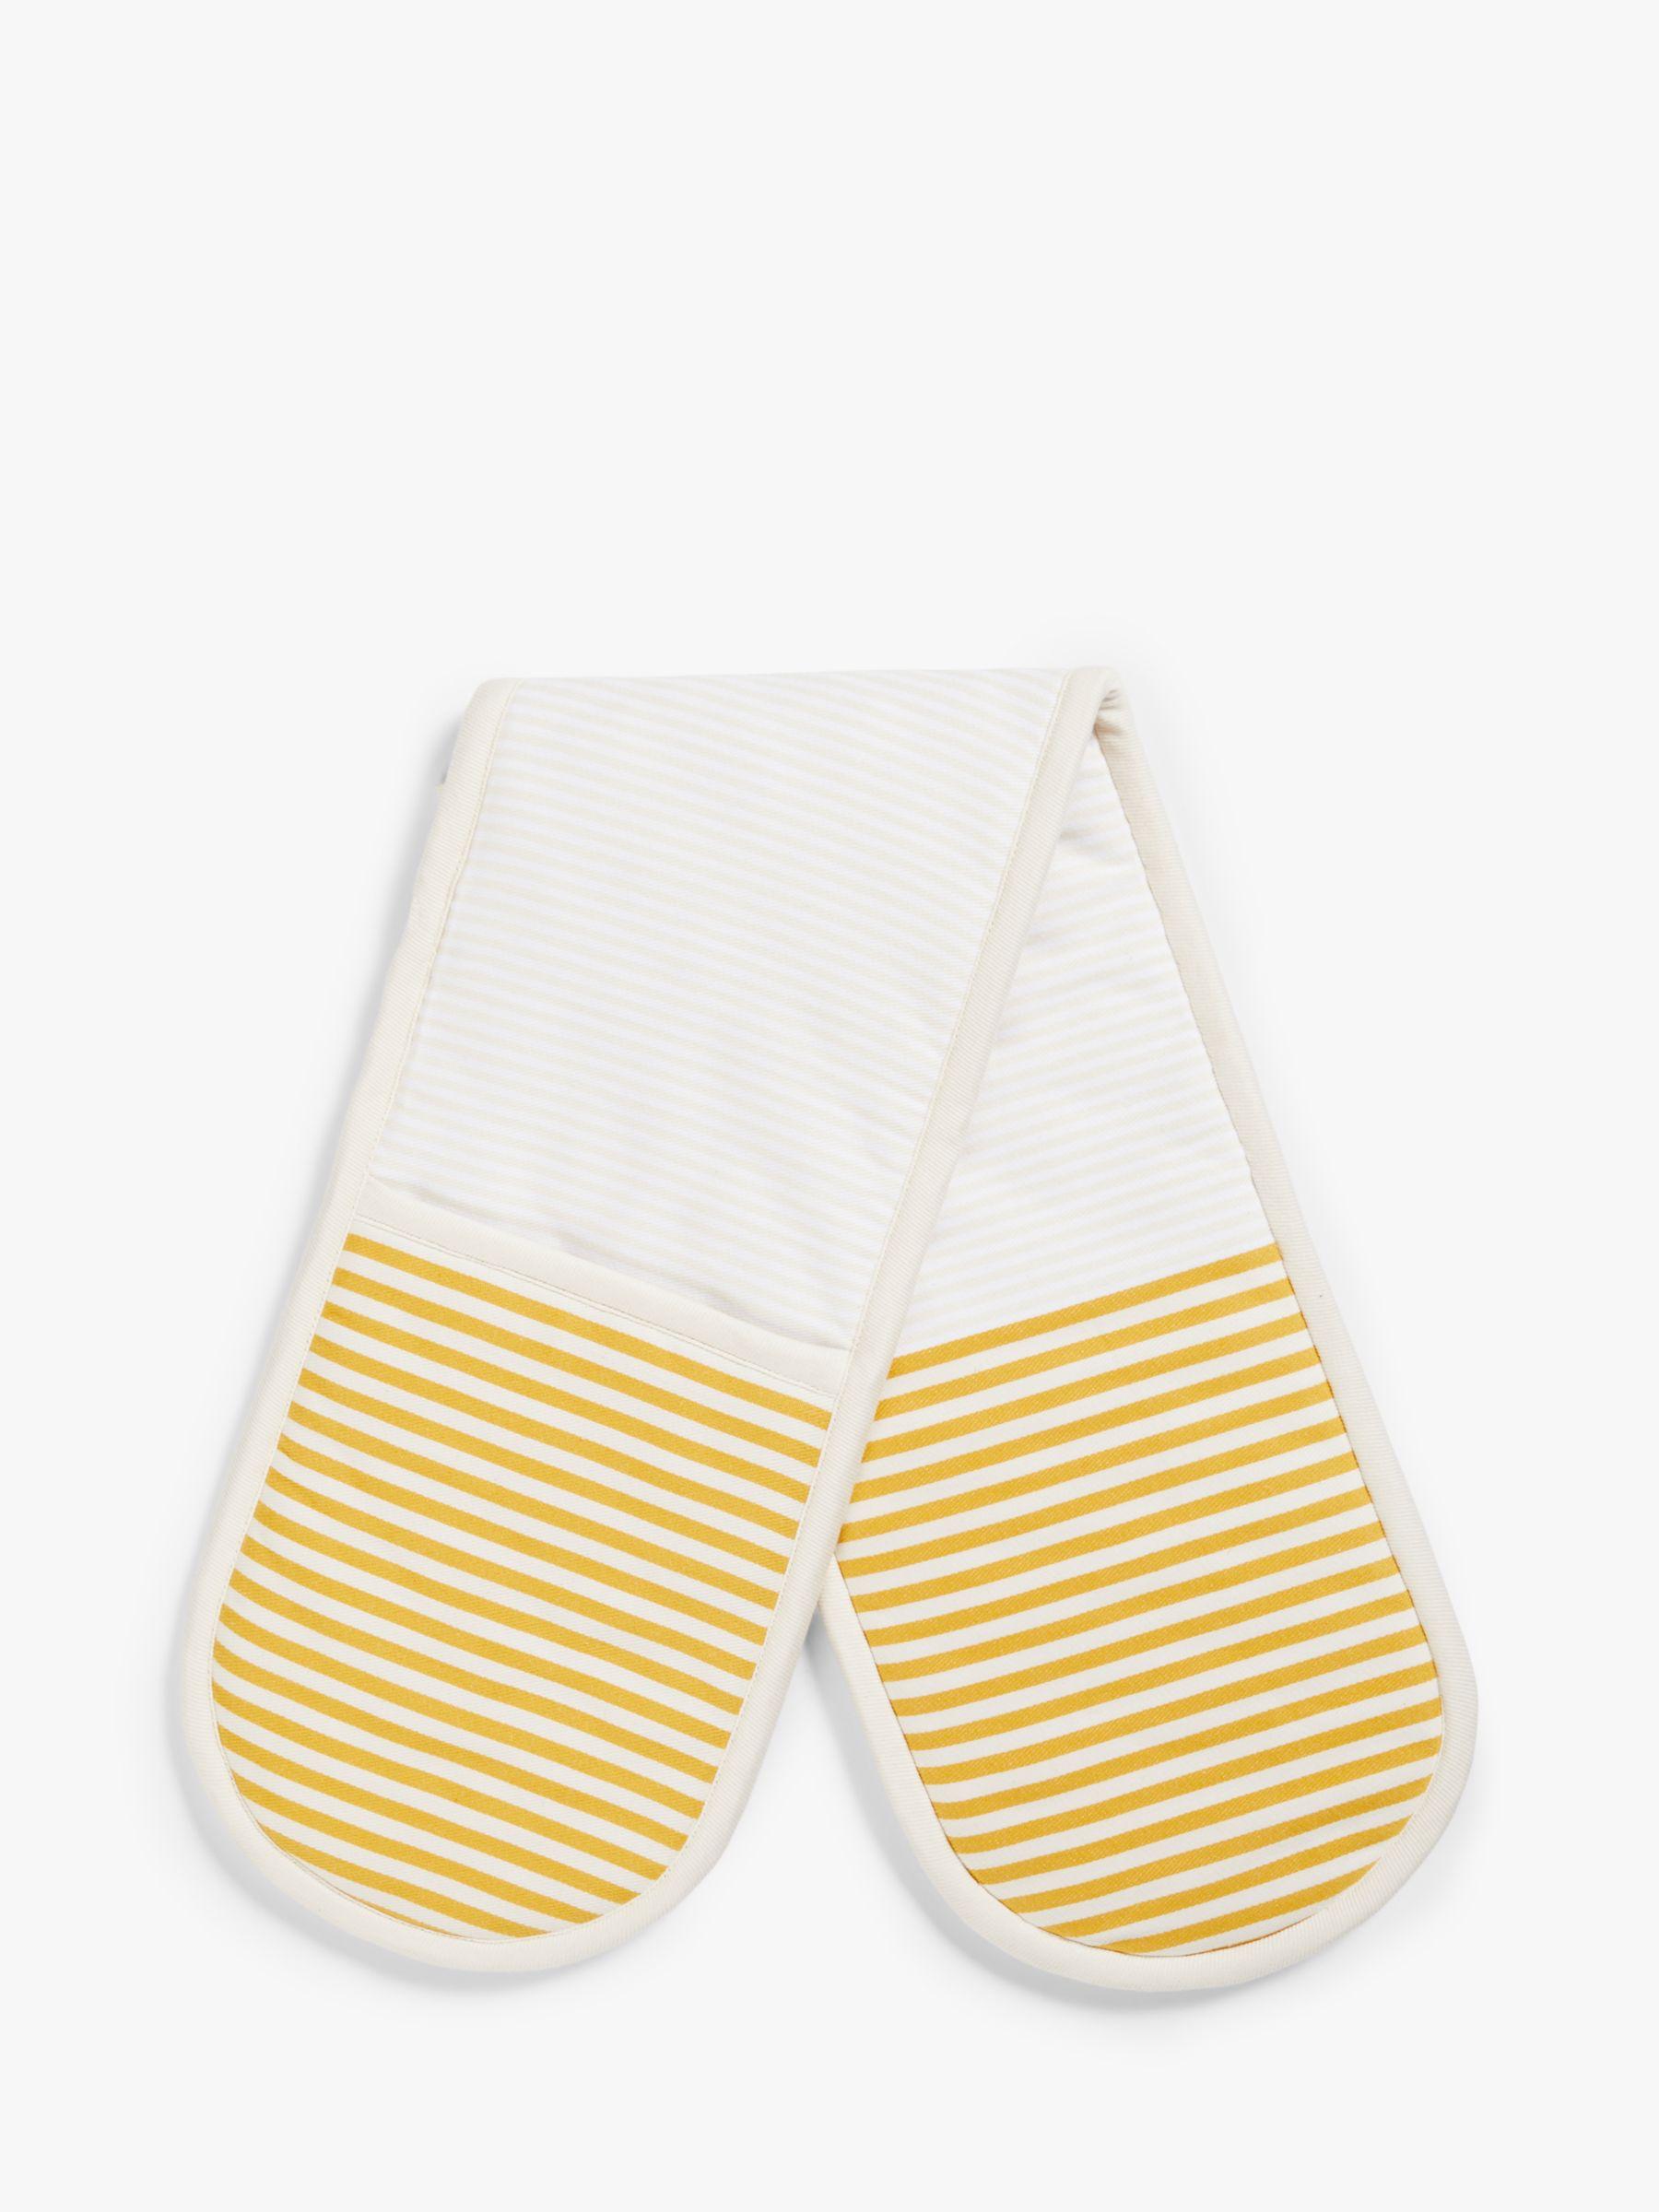 John Lewis & Partners Striped Double Oven Glove, Ochre